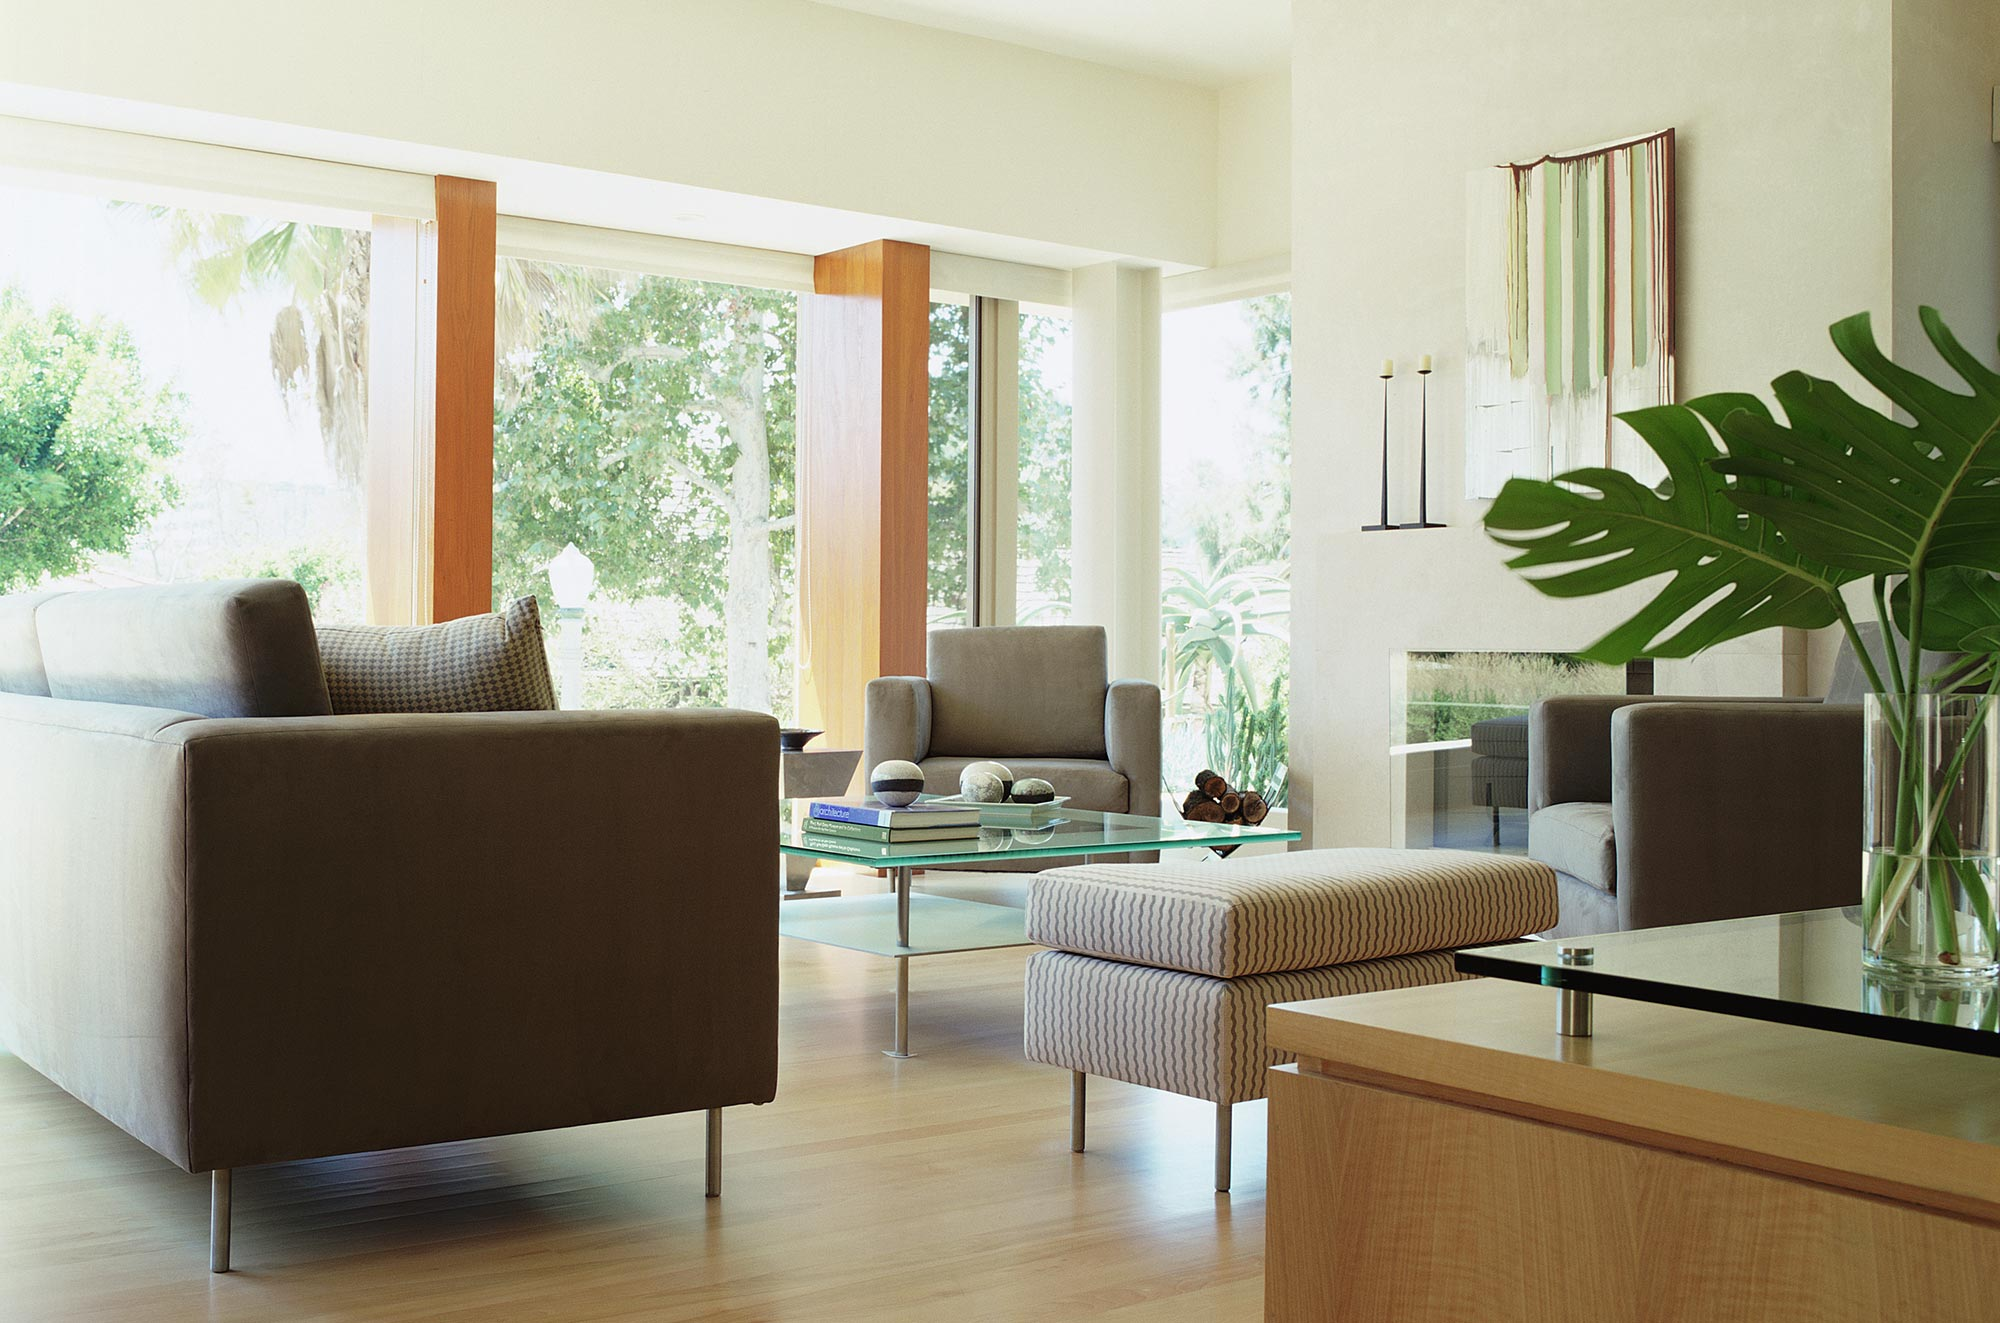 emerson-living-room